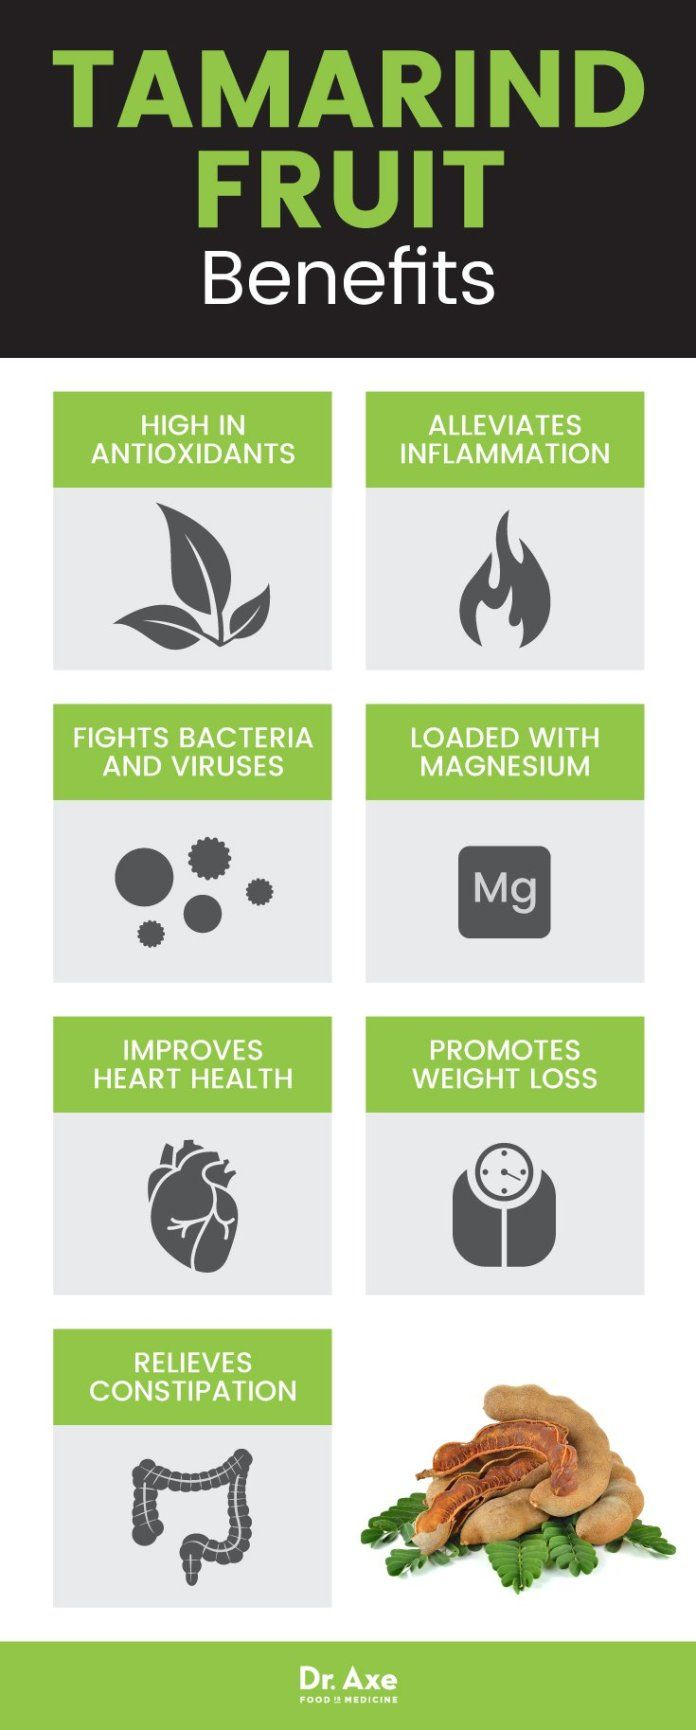 Tamarind Fruit Benefits Dr Axe Fruit Benefits Tamarind Fruit Tamarind